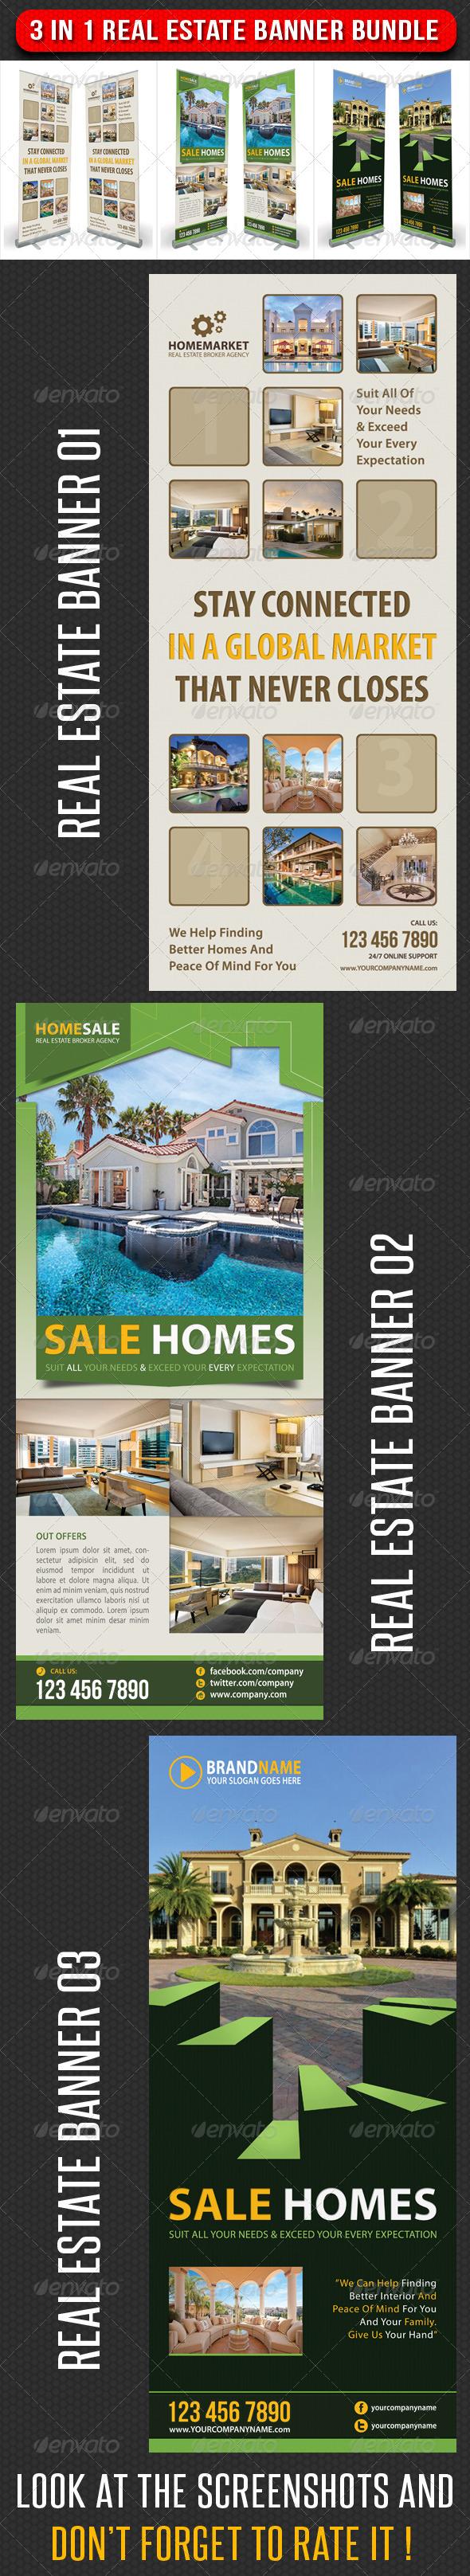 3 in 1 Real Estate Banner Bundle 01 - Signage Print Templates